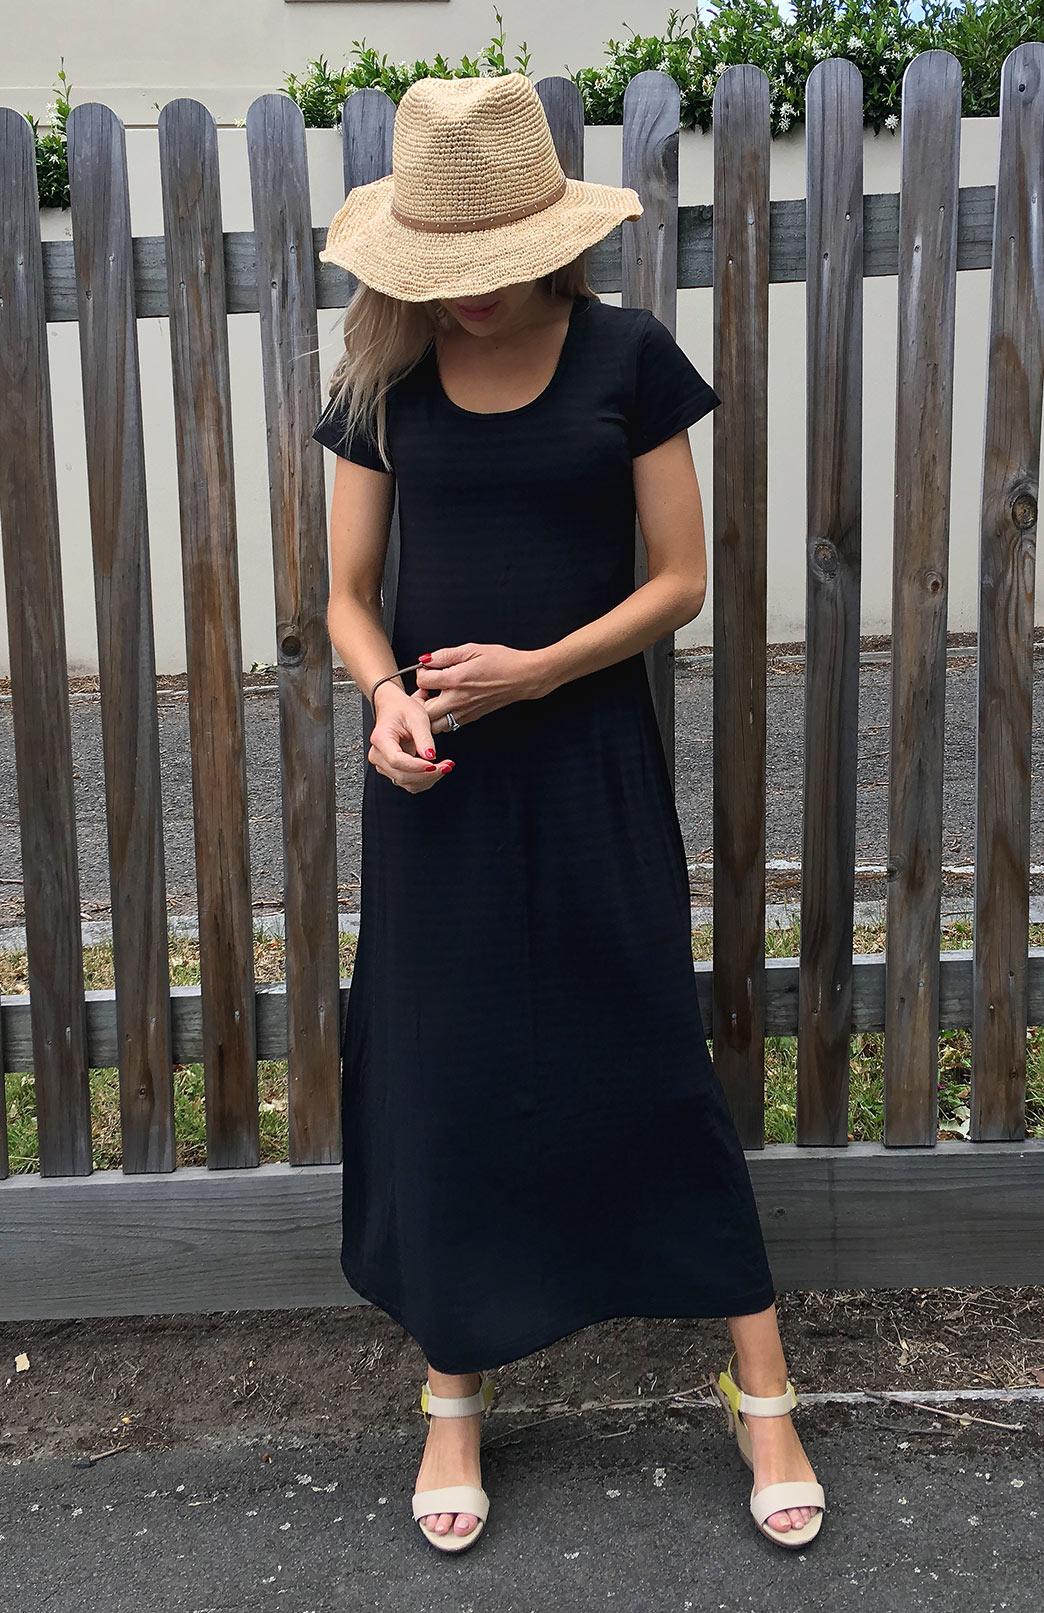 T-Shirt Maxi Dress - Women's Dark Grey Stripe Merino Wool Modal Blend T-Shirt Maxi Dress - Smitten Merino Tasmania Australia